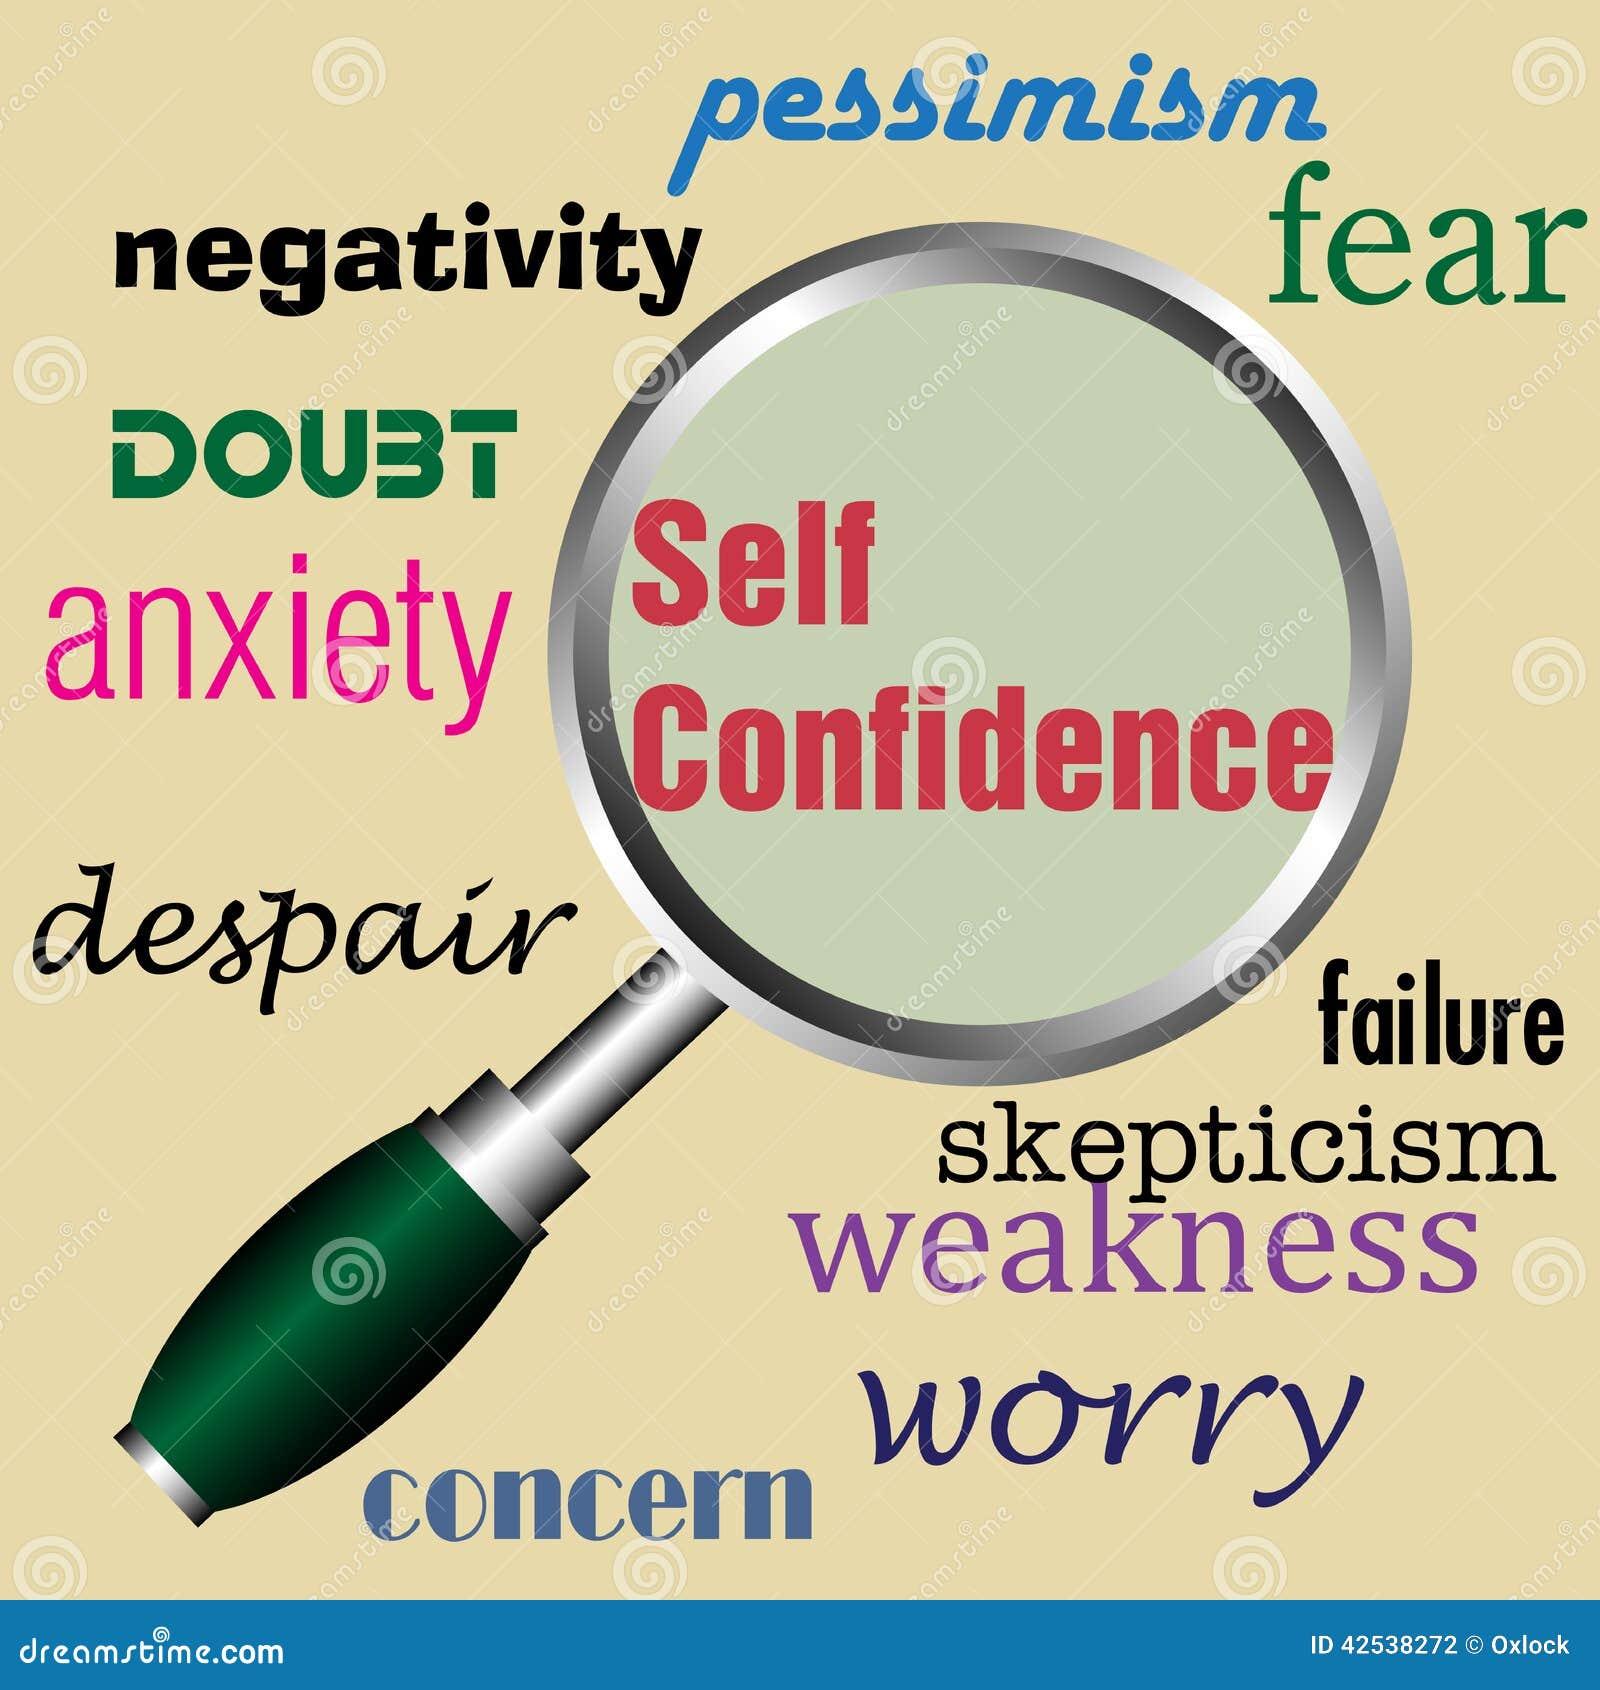 Self Confidence Stock Vector - Image: 42538272